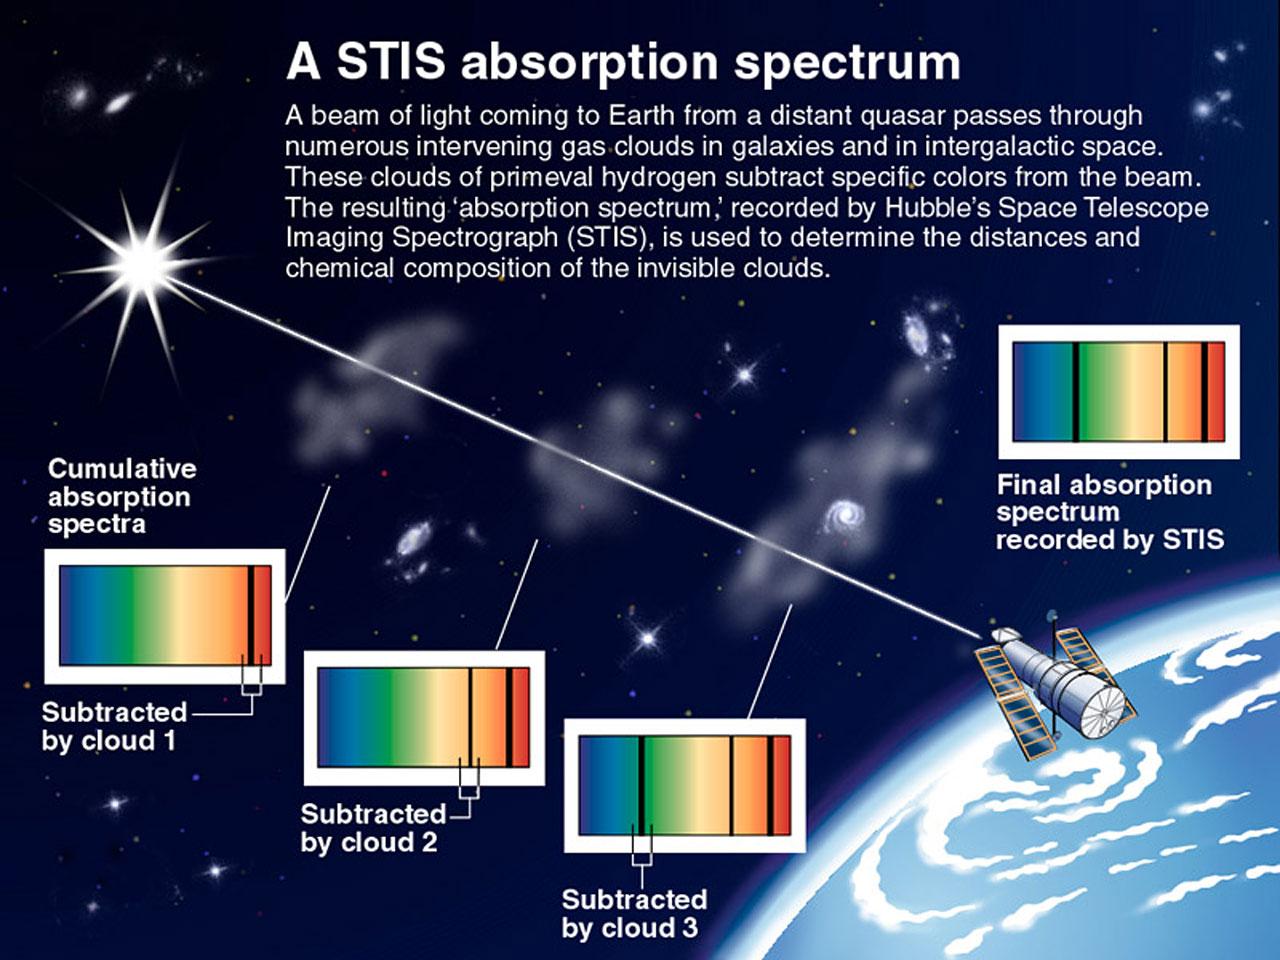 how does solar energy work diagram stromberg carburetor a stis absorption spectrum | esa/hubble